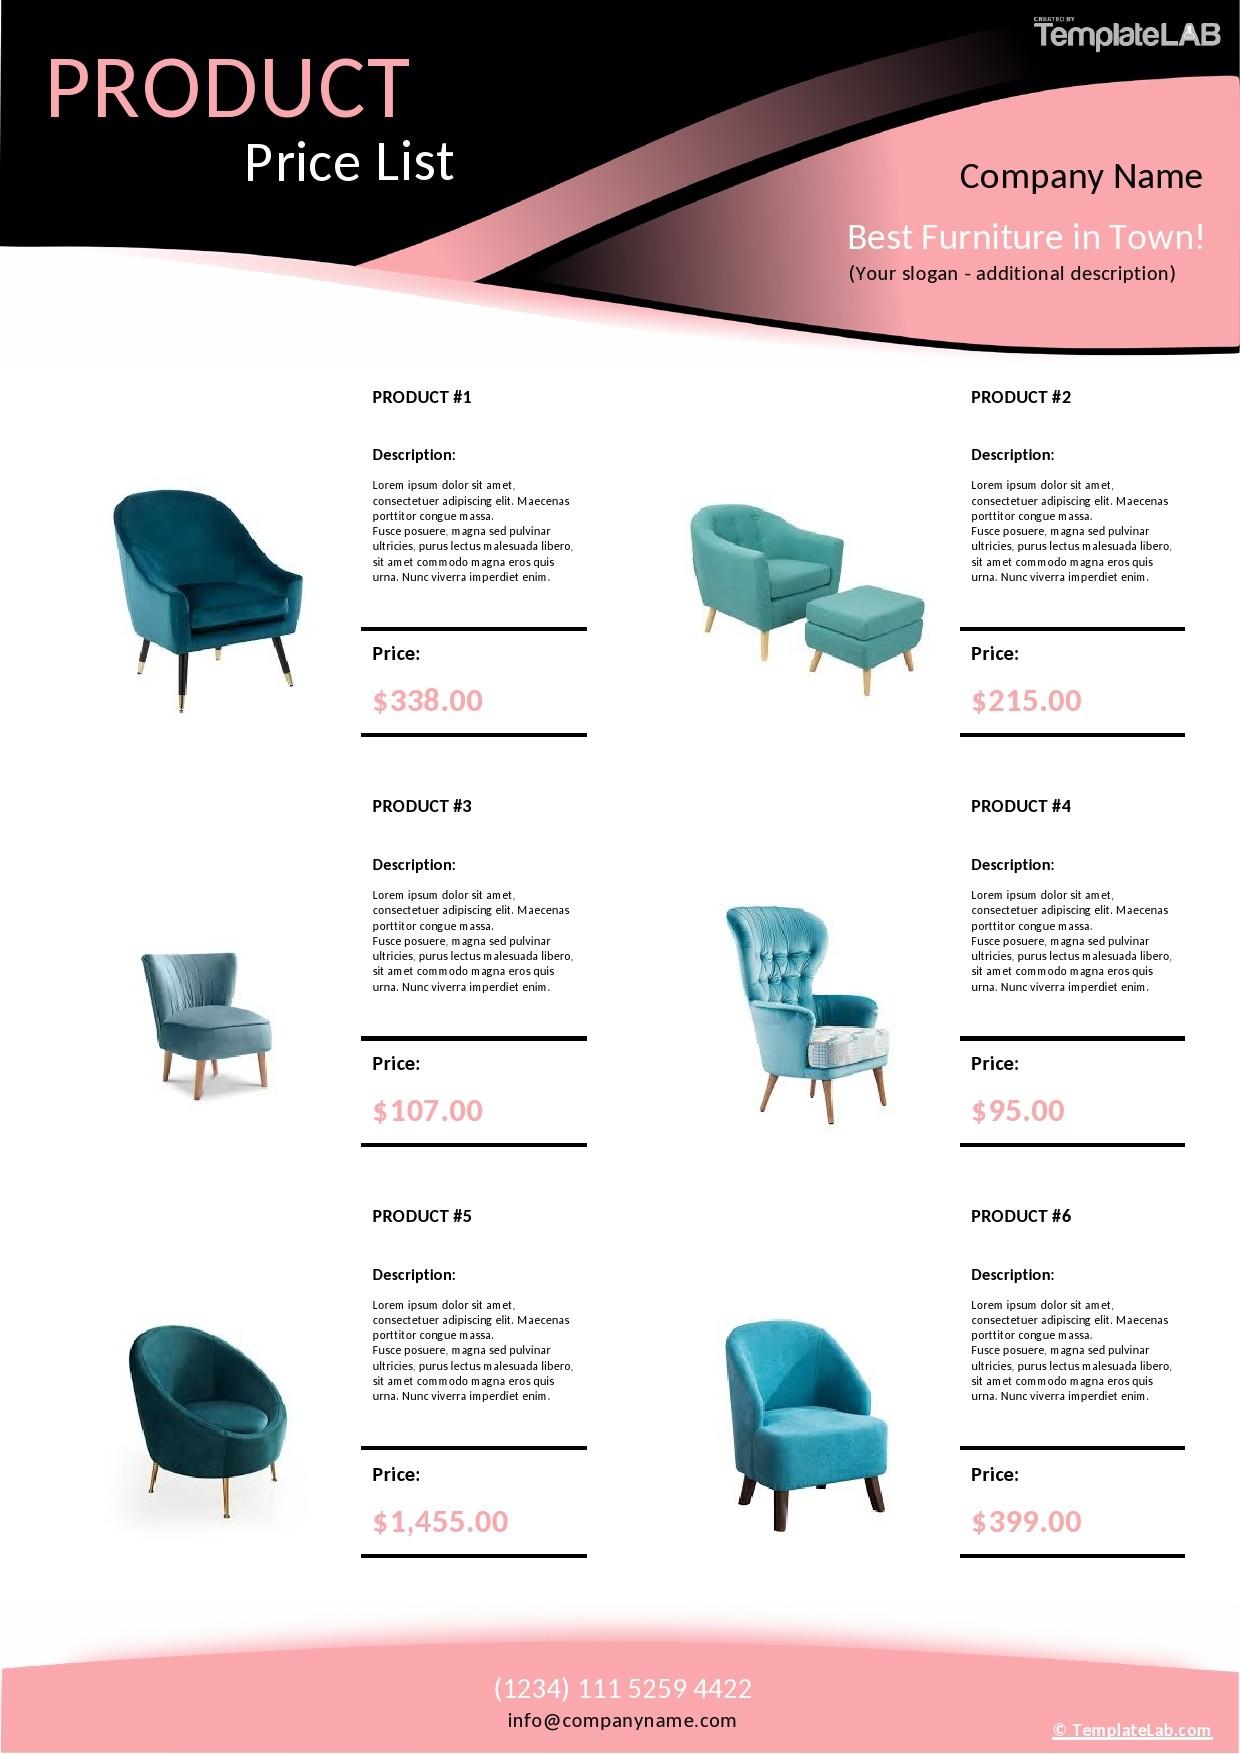 Free Product Price List Template - TemplateLab.com